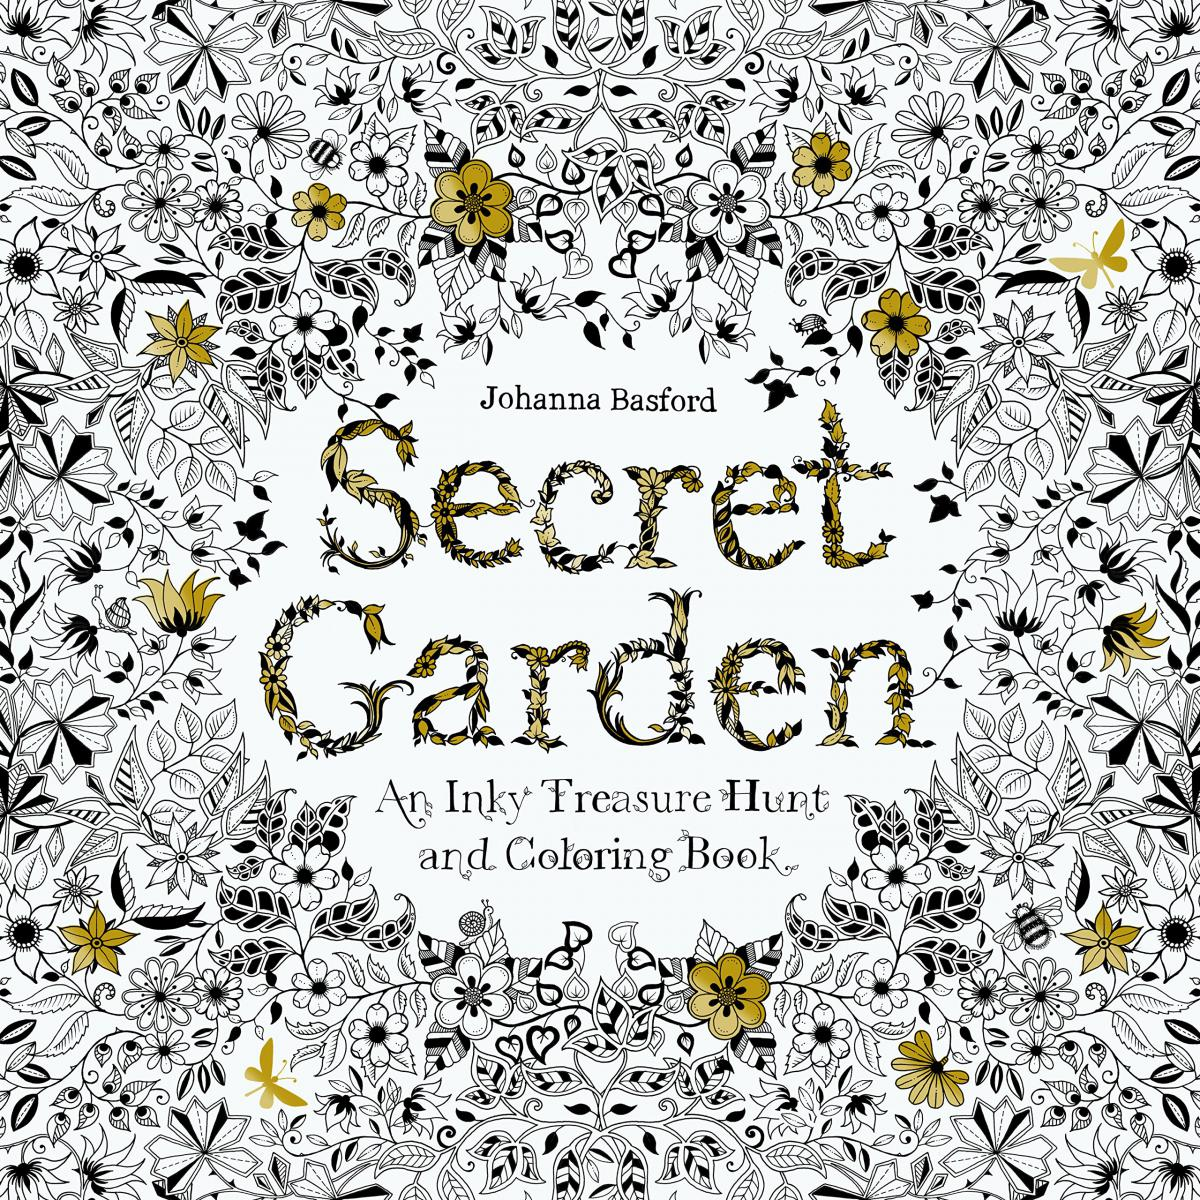 The secret garden coloring book target - Datacaciques